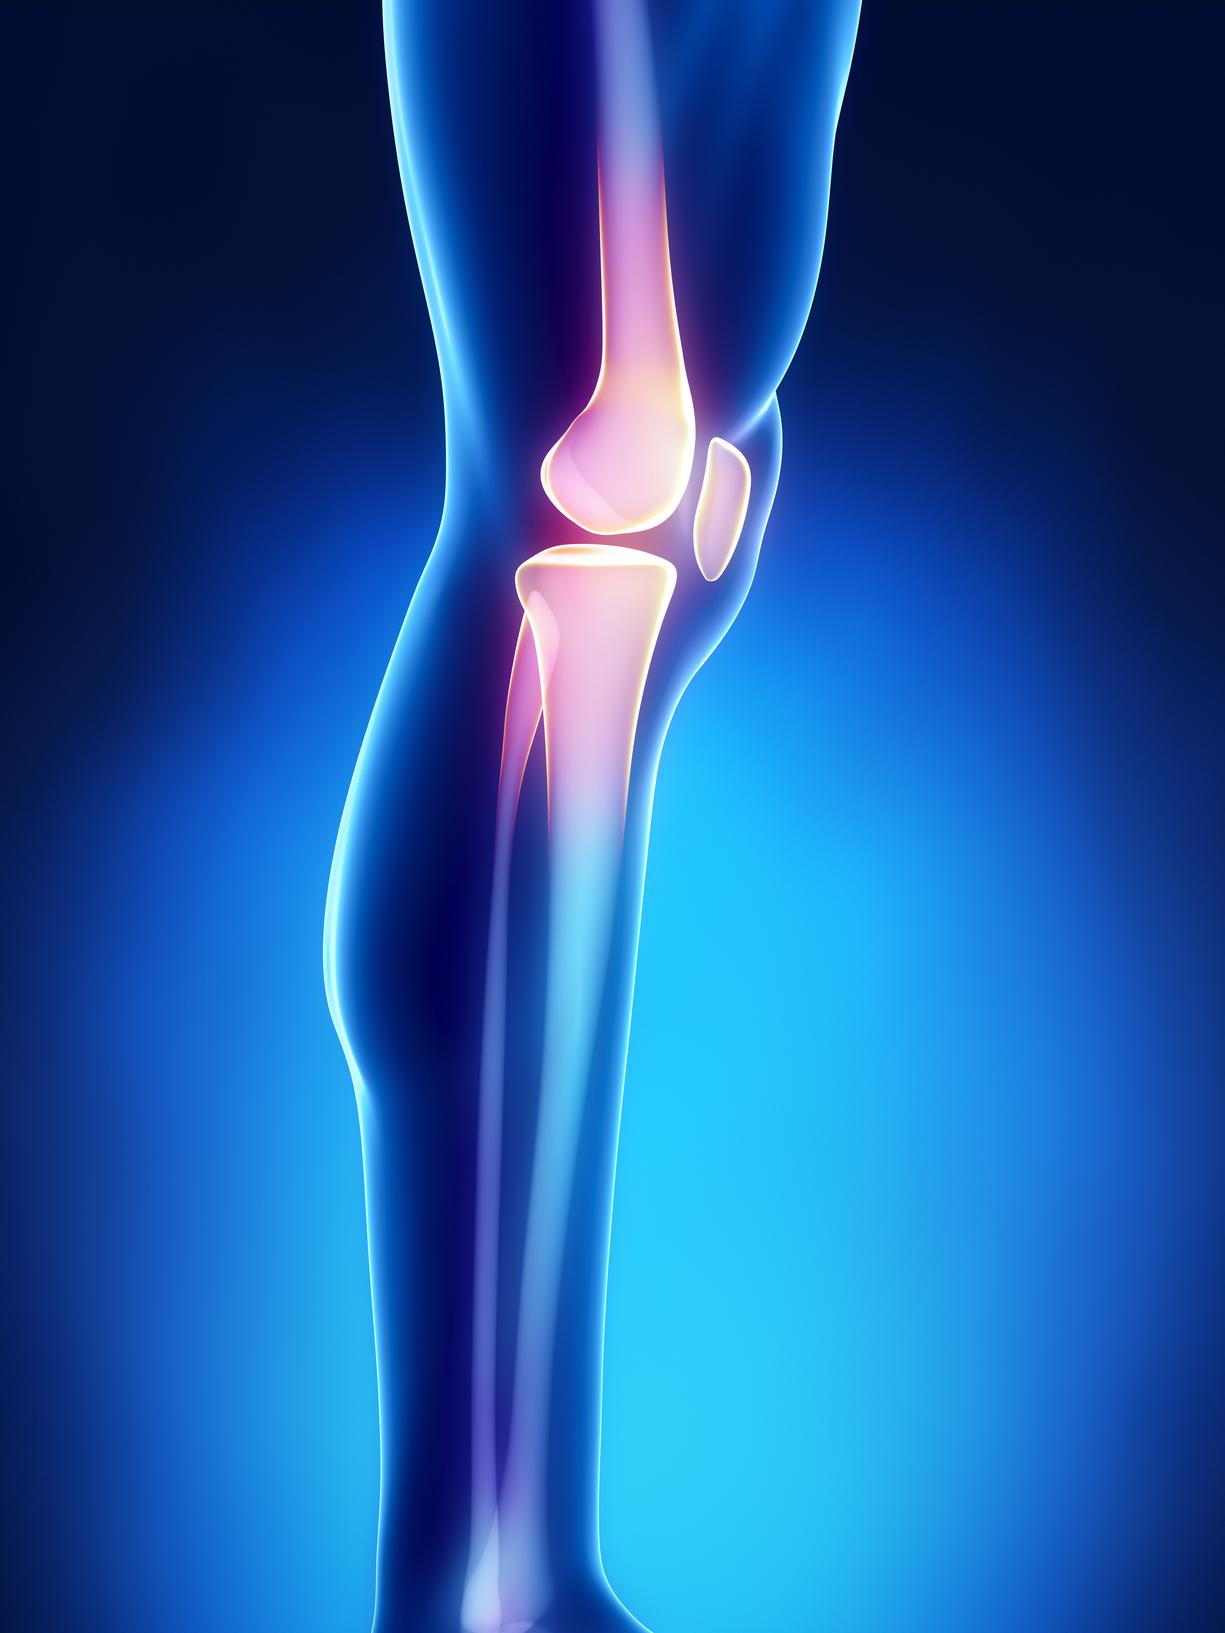 orthopedic templating software - orthopedics emr ehr software prognocis revenuexl